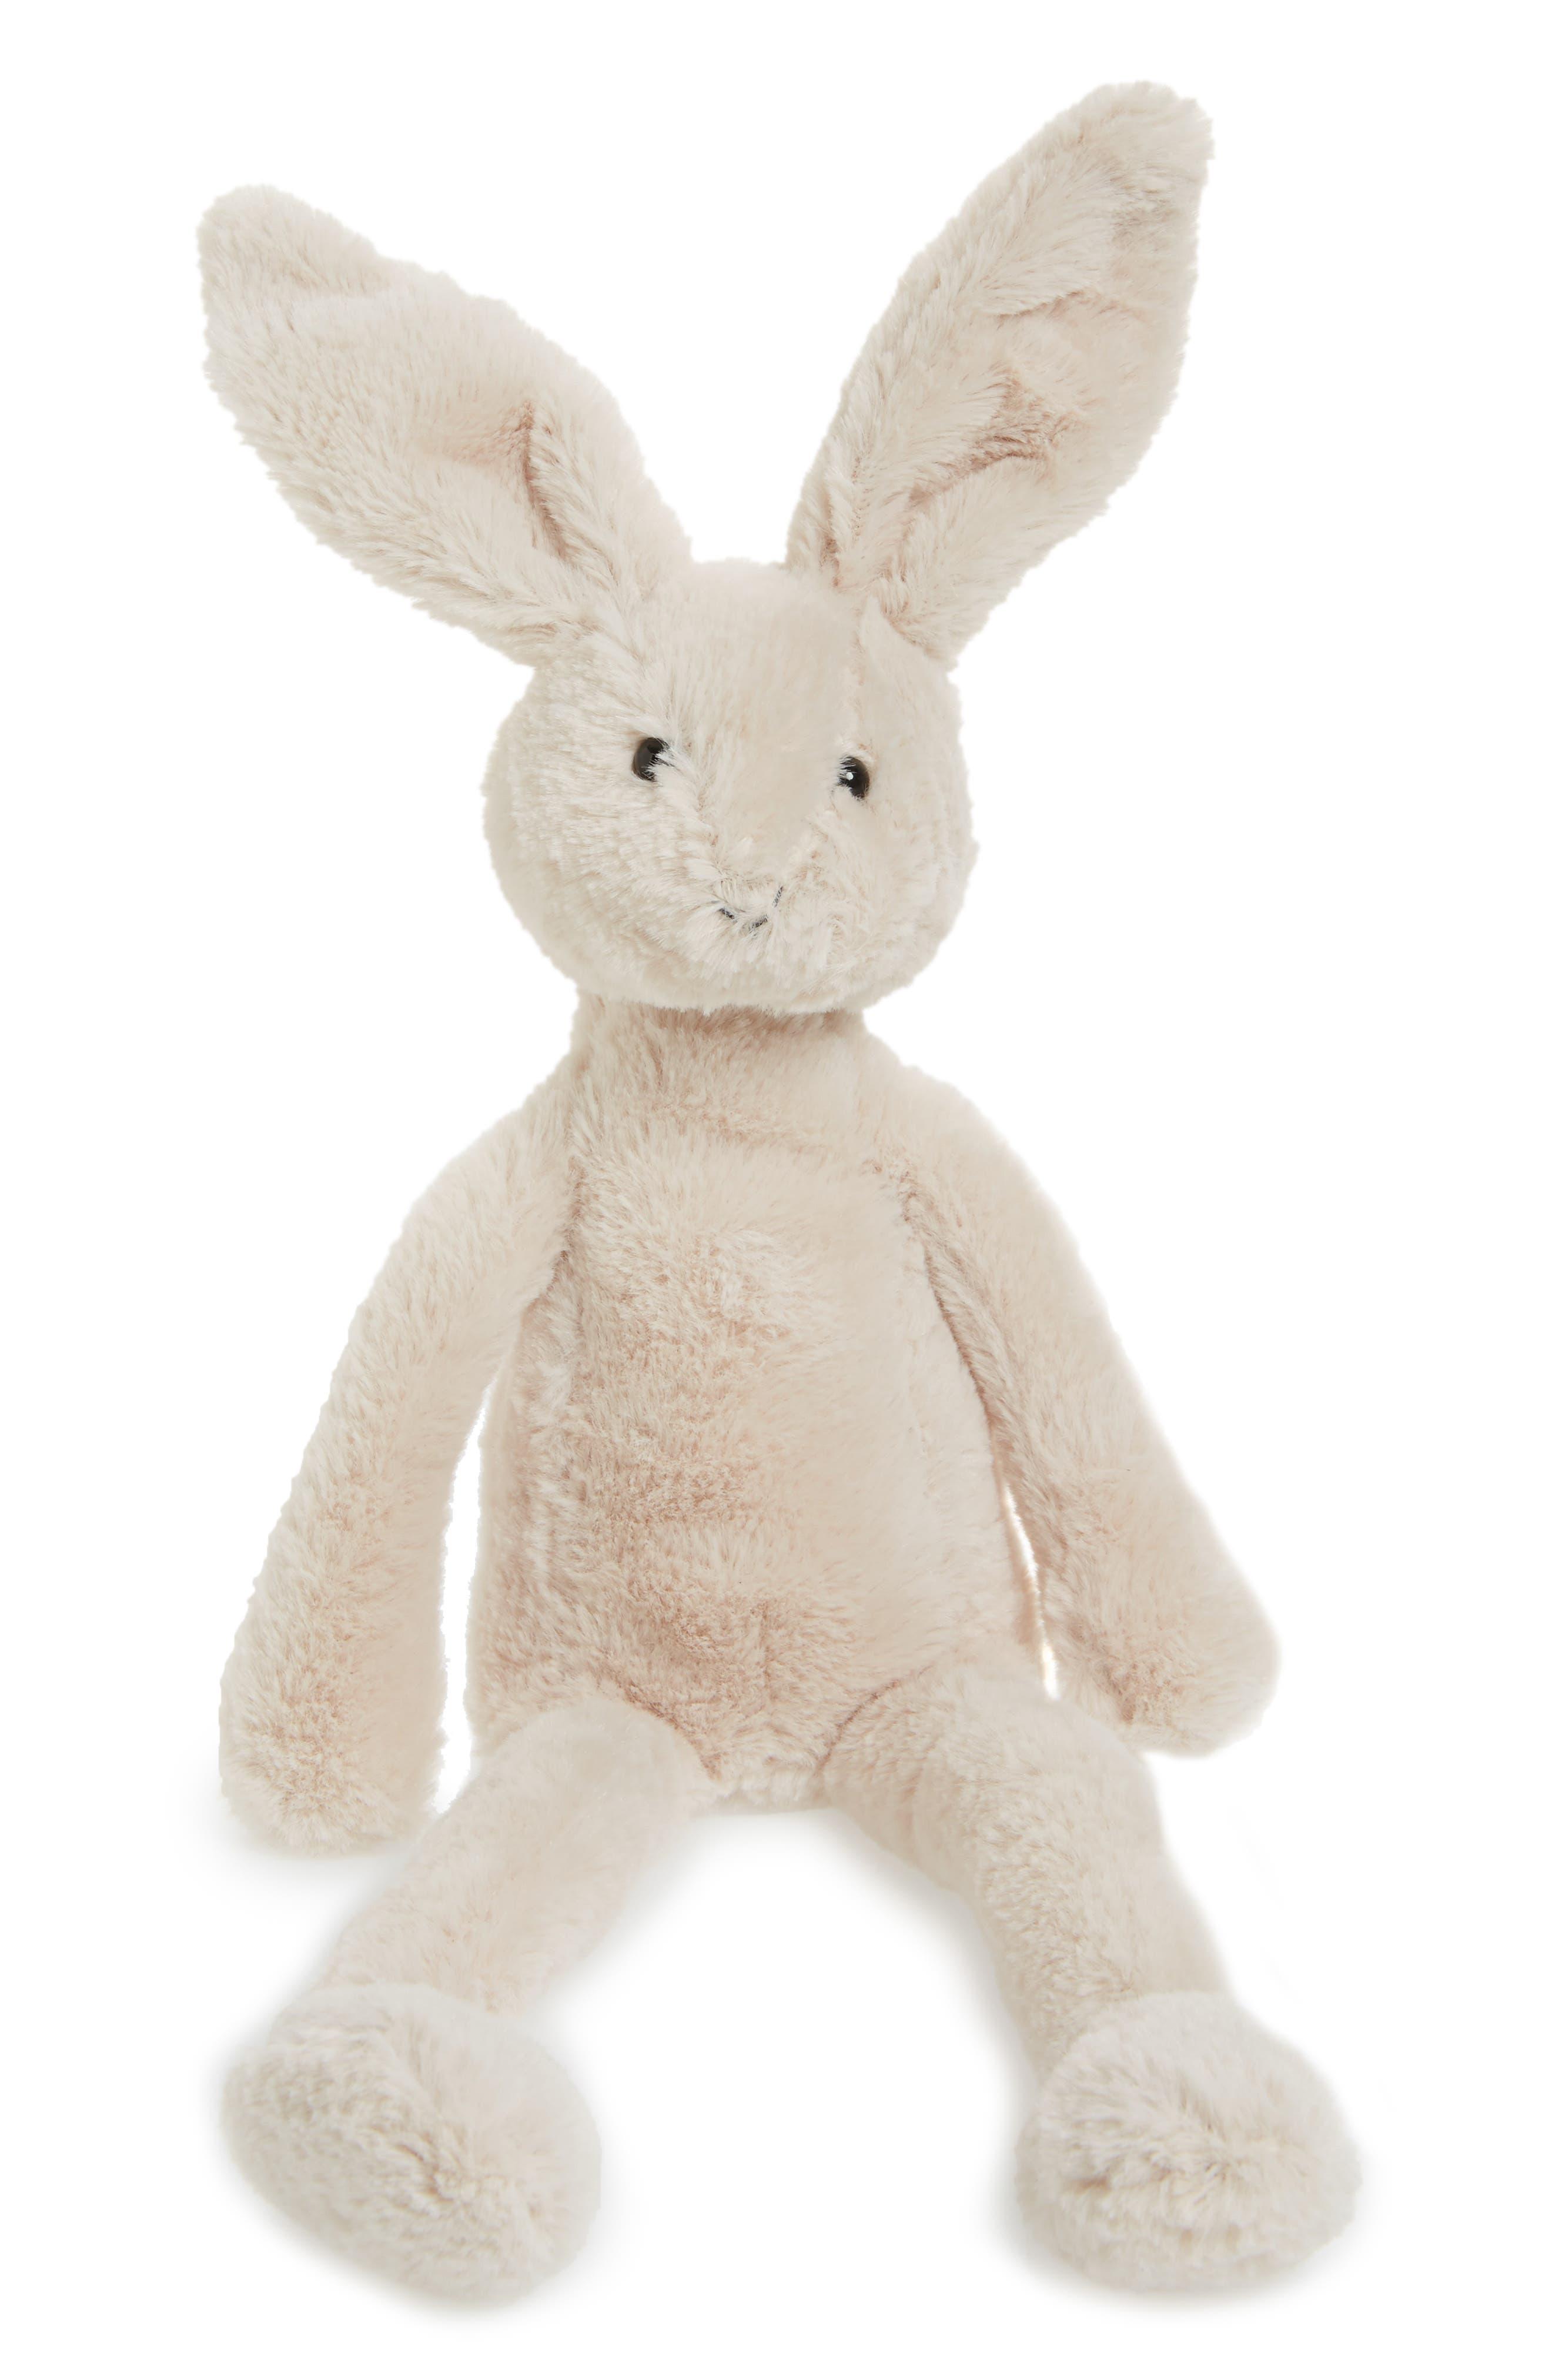 Pitterpat Bunny Stuffed Animal,                         Main,                         color, CREAM